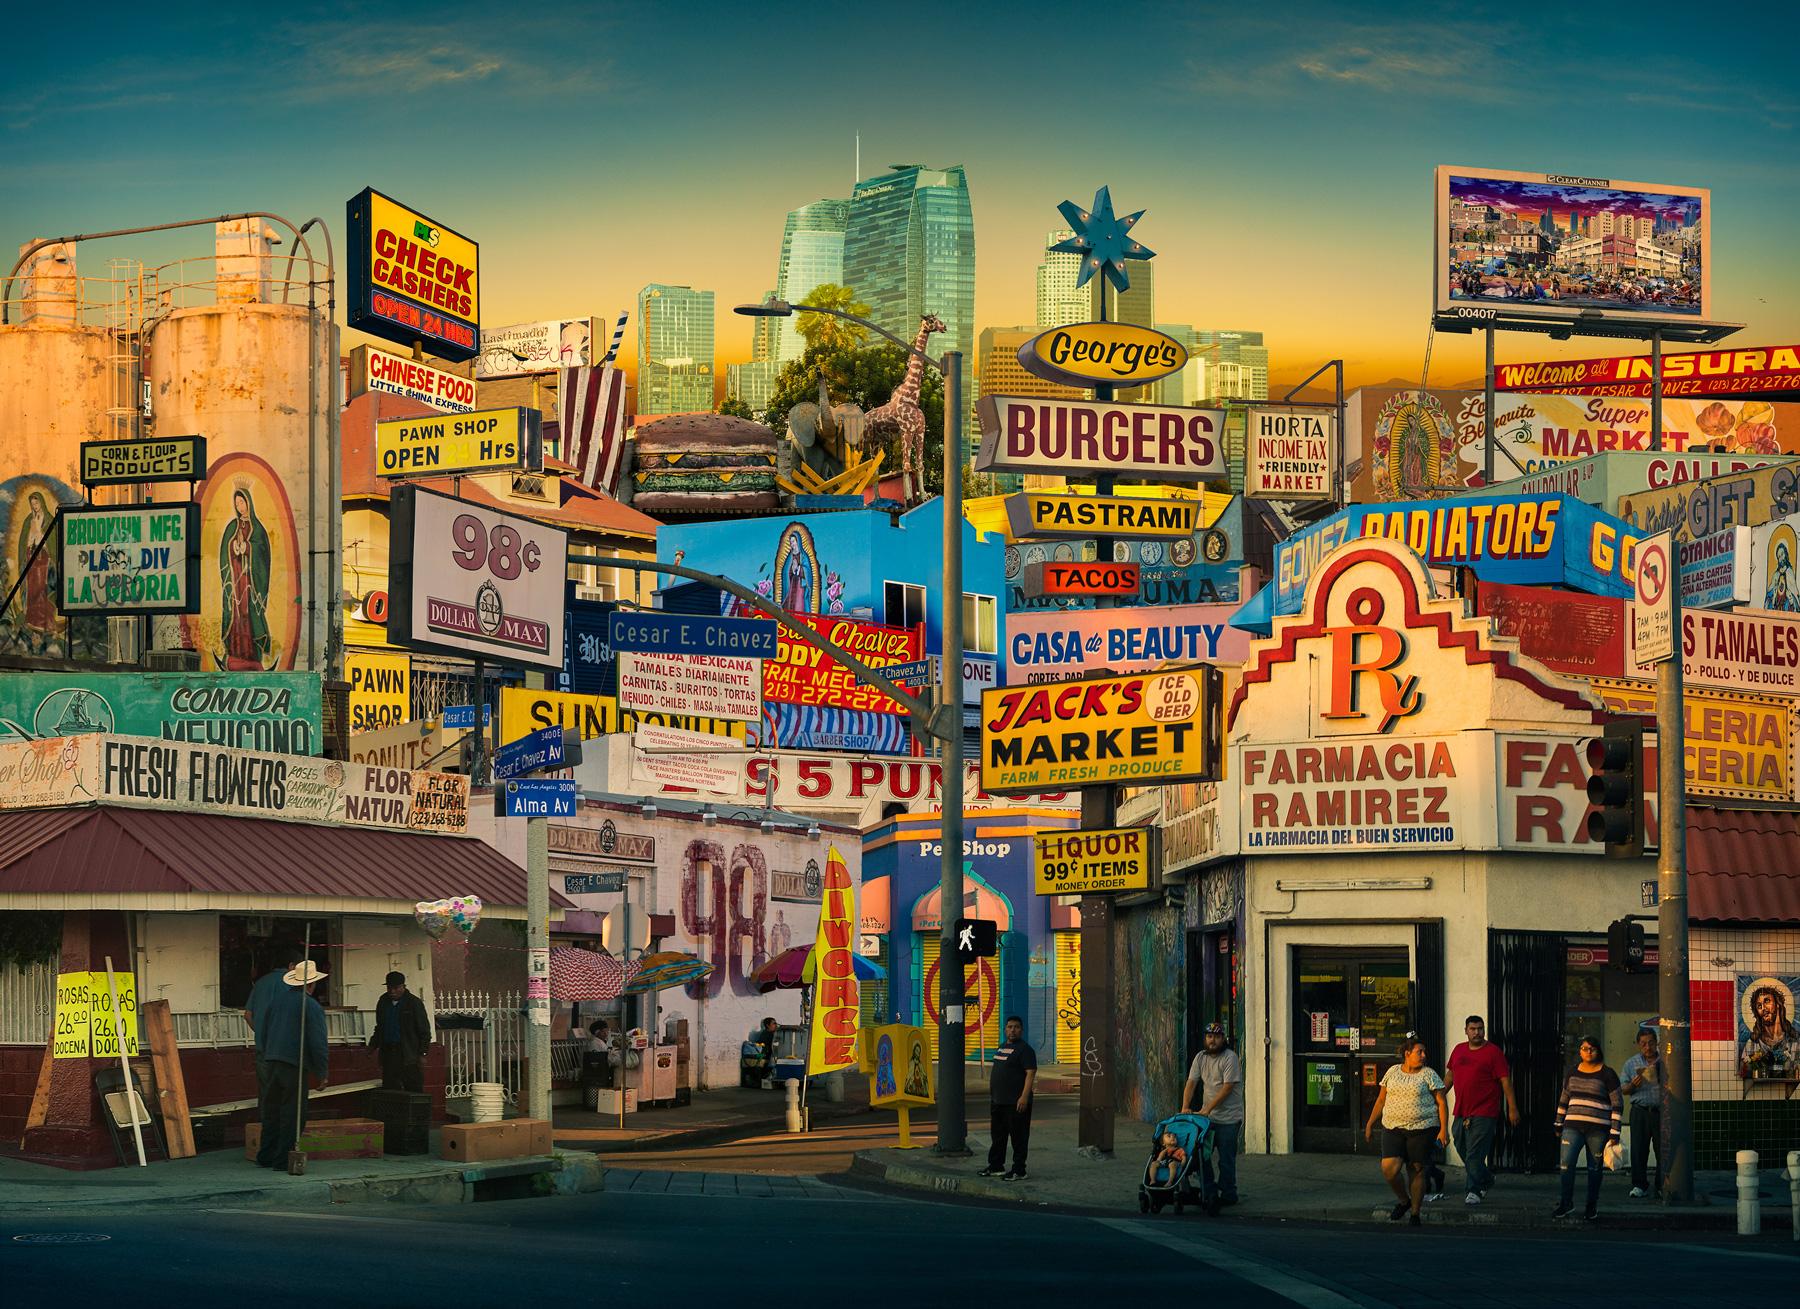 """Boyle Heights"" Los Angeles, CA"